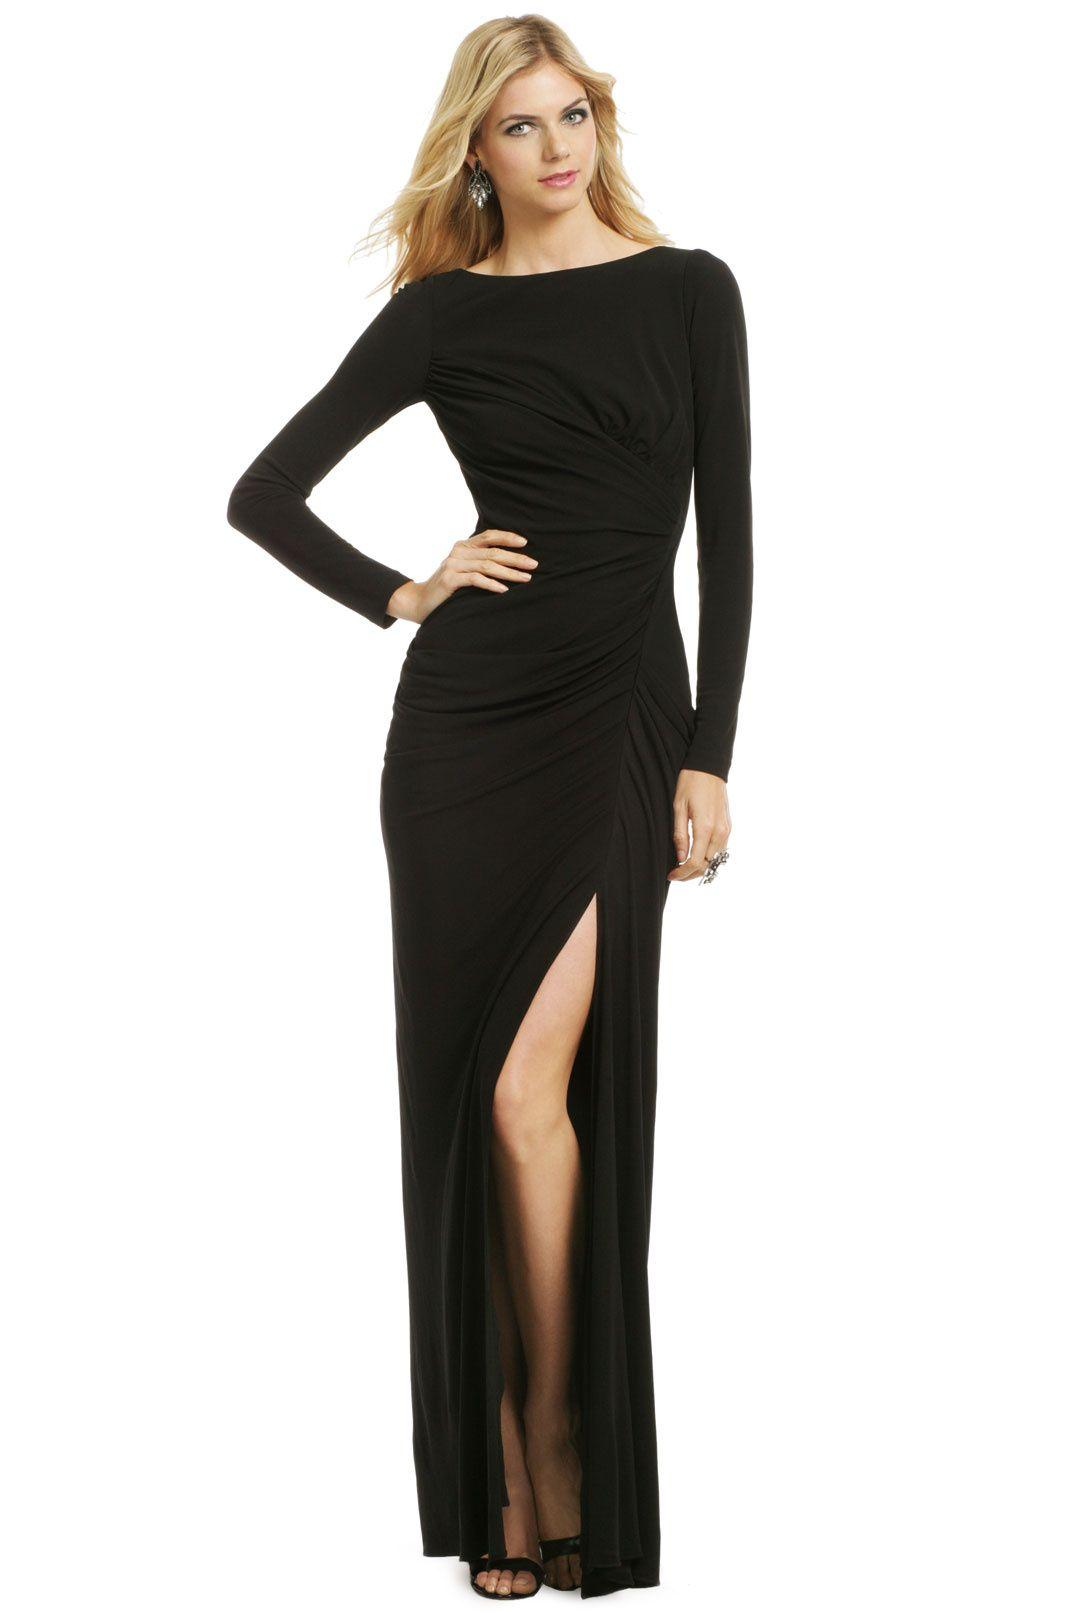 Attractive James Bond Theme Prom Dresses Vignette - Wedding Dresses ...